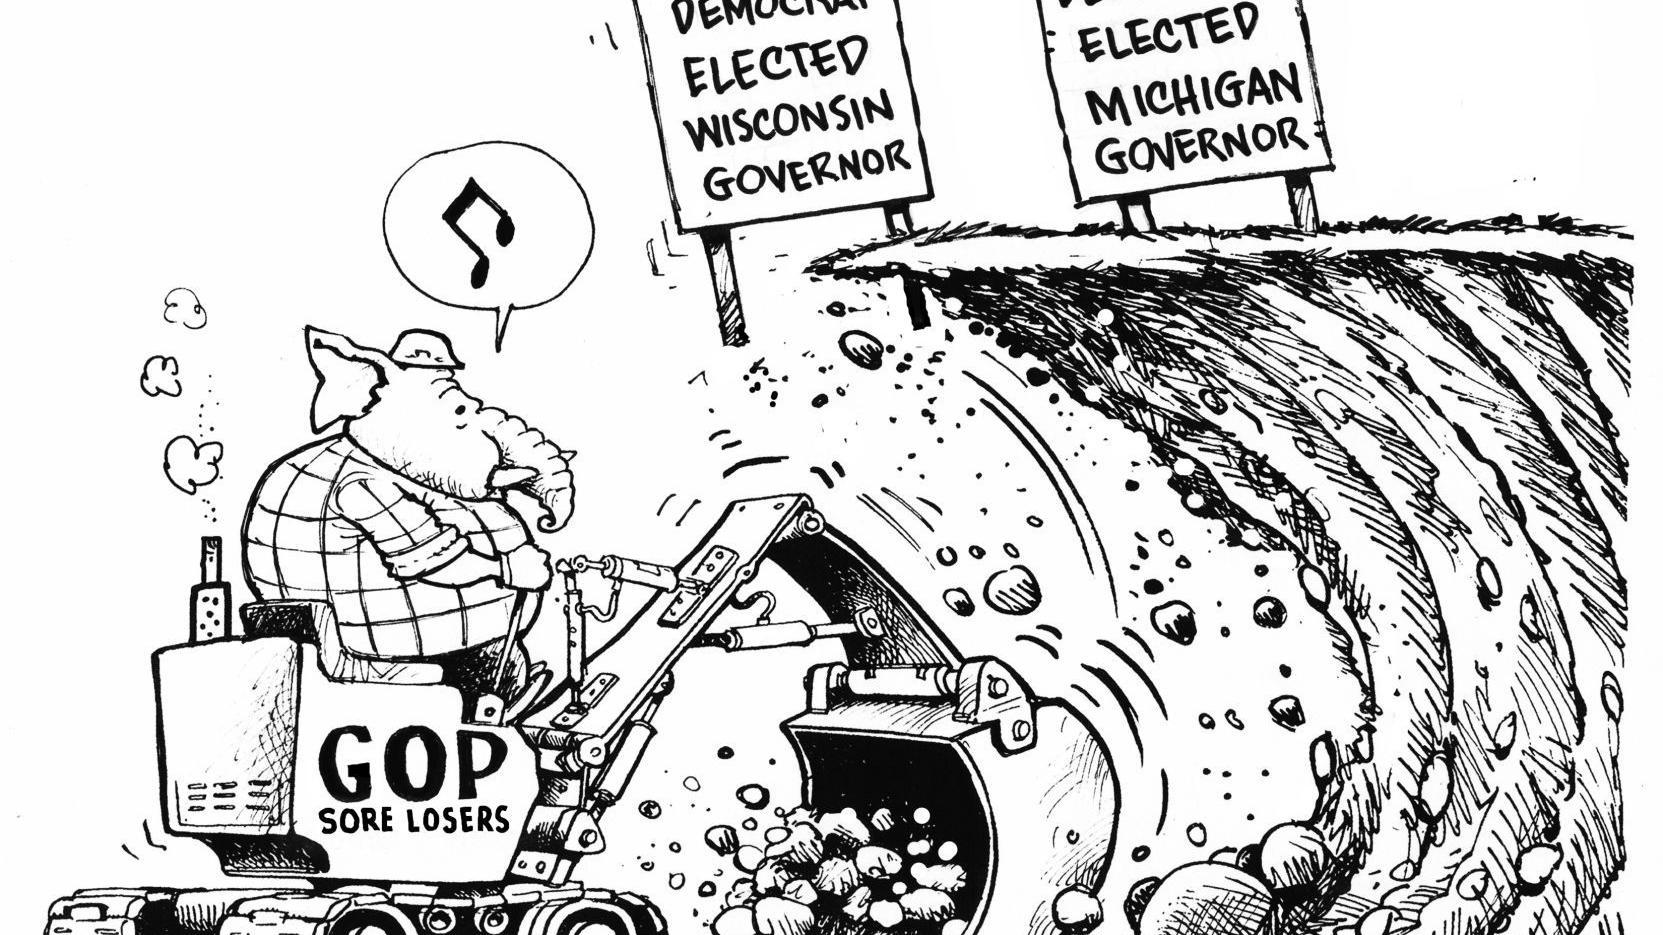 Wisconsin Republicans are sore losers, in Dave Granlund's latest political cartoon